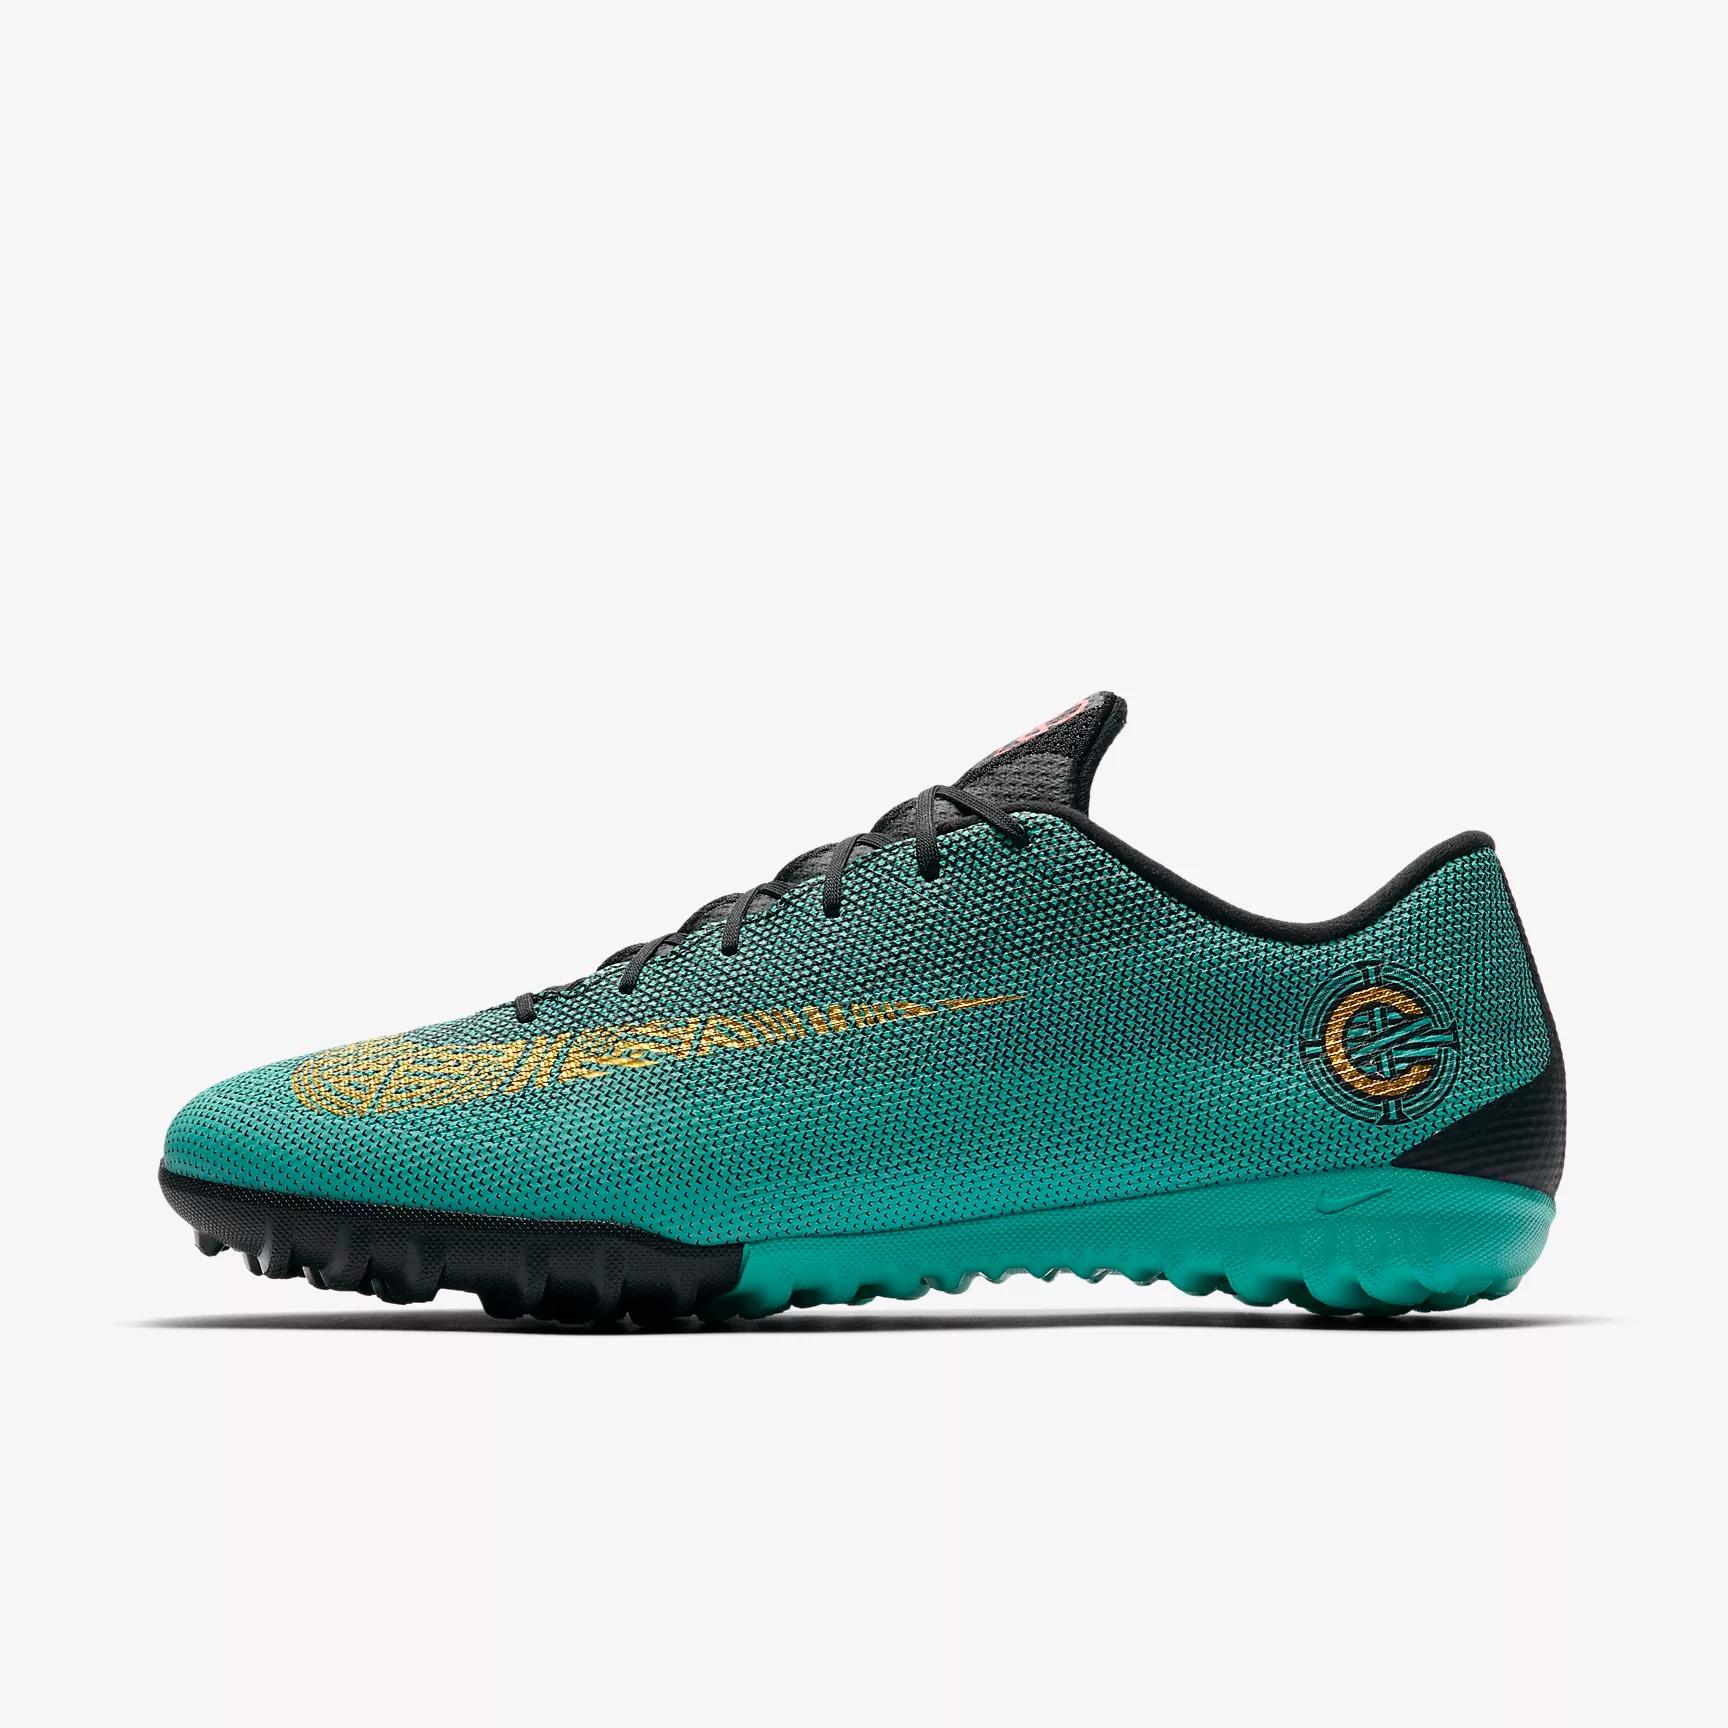 Nike Mercurialx Vapor Xii Academy Cr7 Tf Soccer Cleats